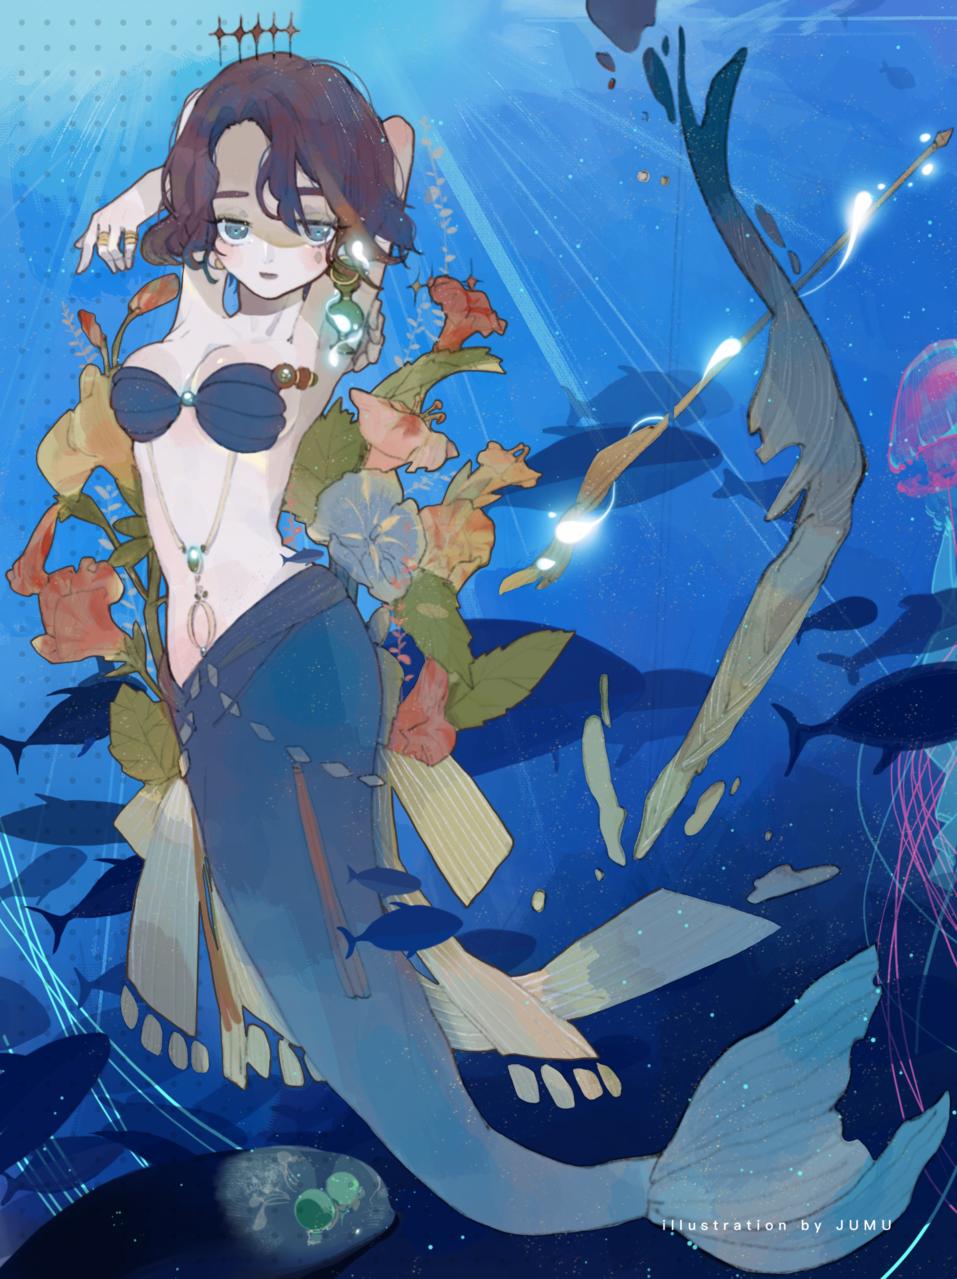 人鱼 Illust of 九木口冬 深海少女 人魚姫 人鱼 mermaid